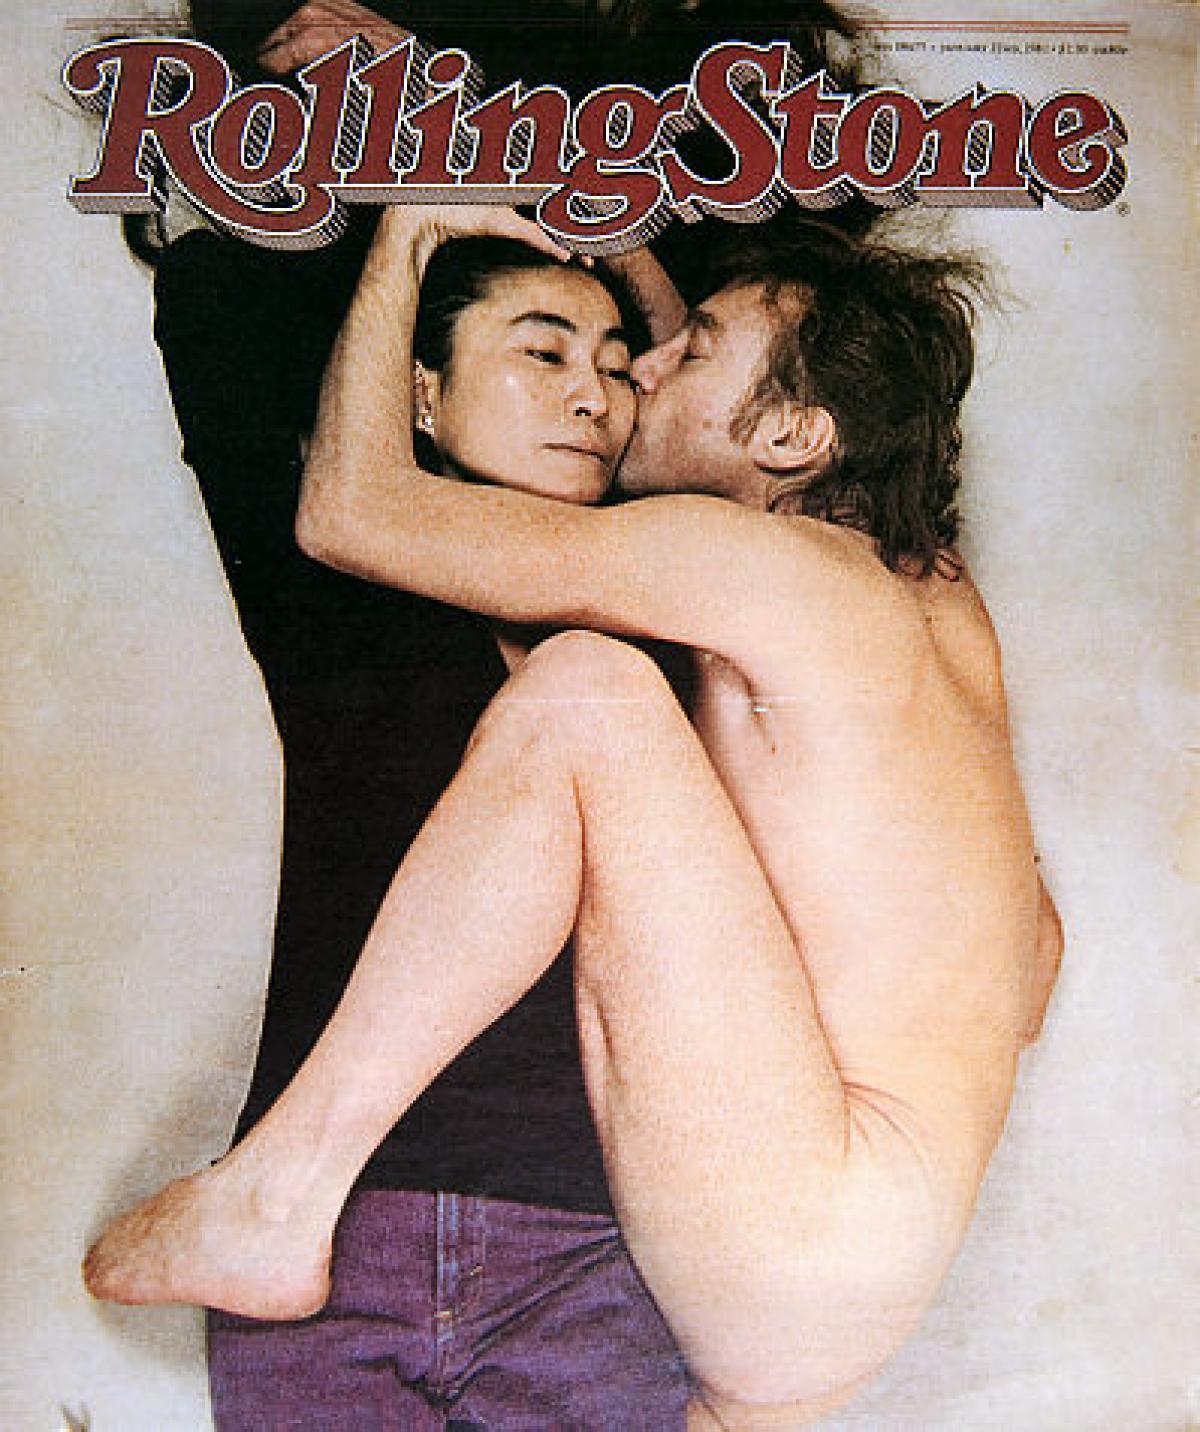 John Lennon Yoko Ono Rolling Stone